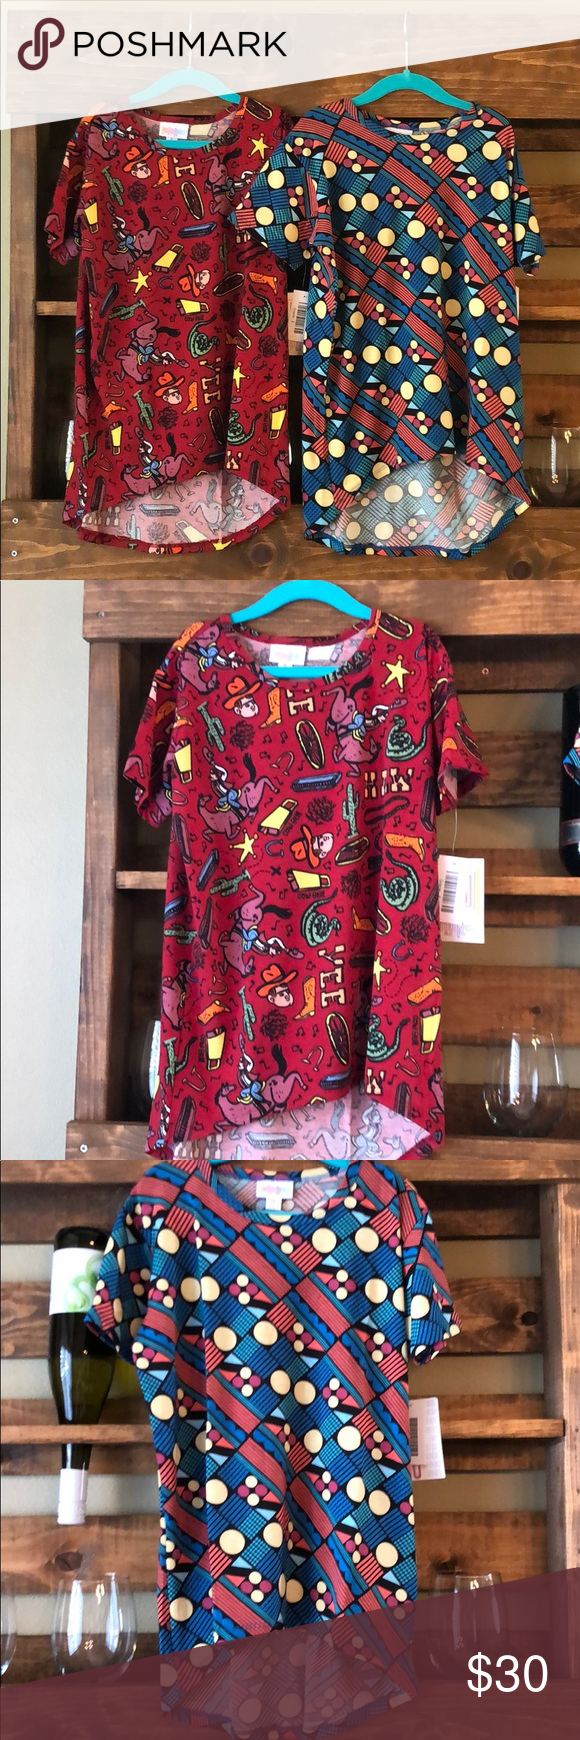 a4323c0cca585 LuLaRoe Gracie Shirts LuLaRoe Gracie Kids t-shirt. NWT. Size 8. Selling